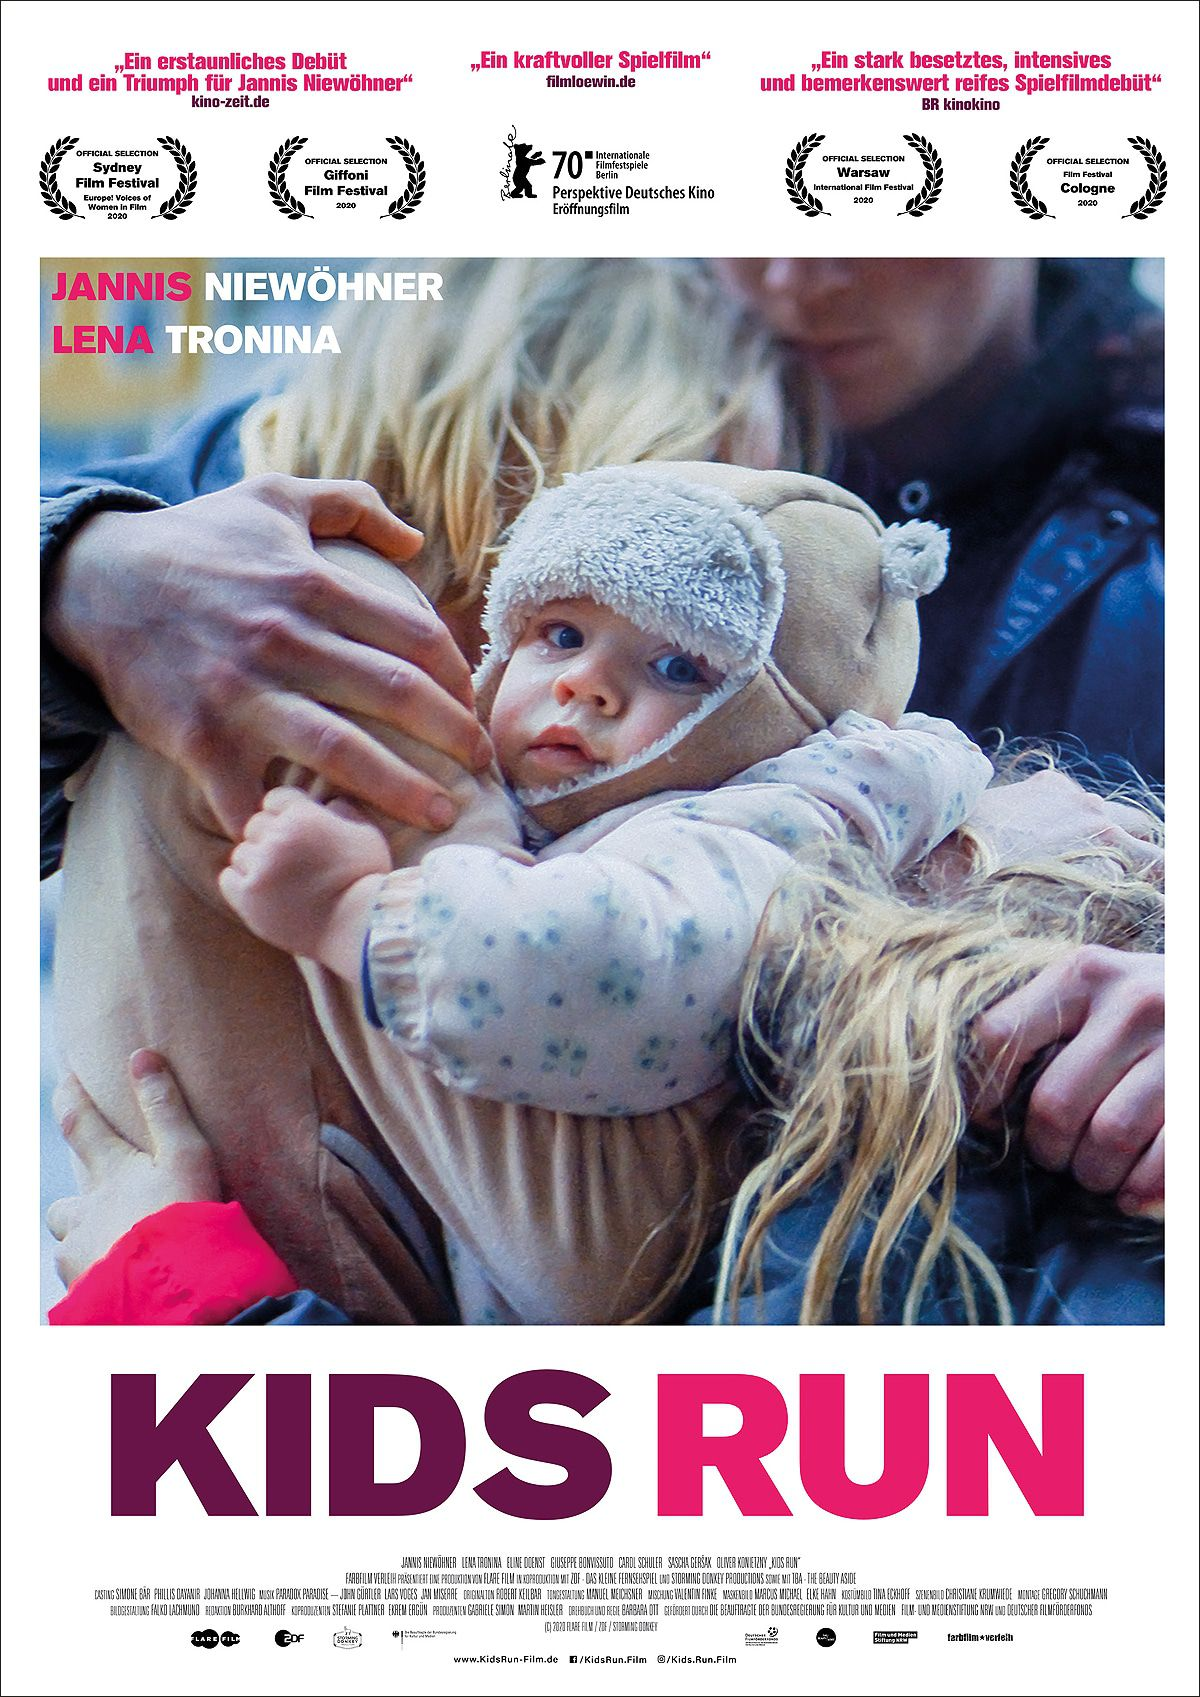 KIDS RUN 04 © Flare Film_Falko Lachmund